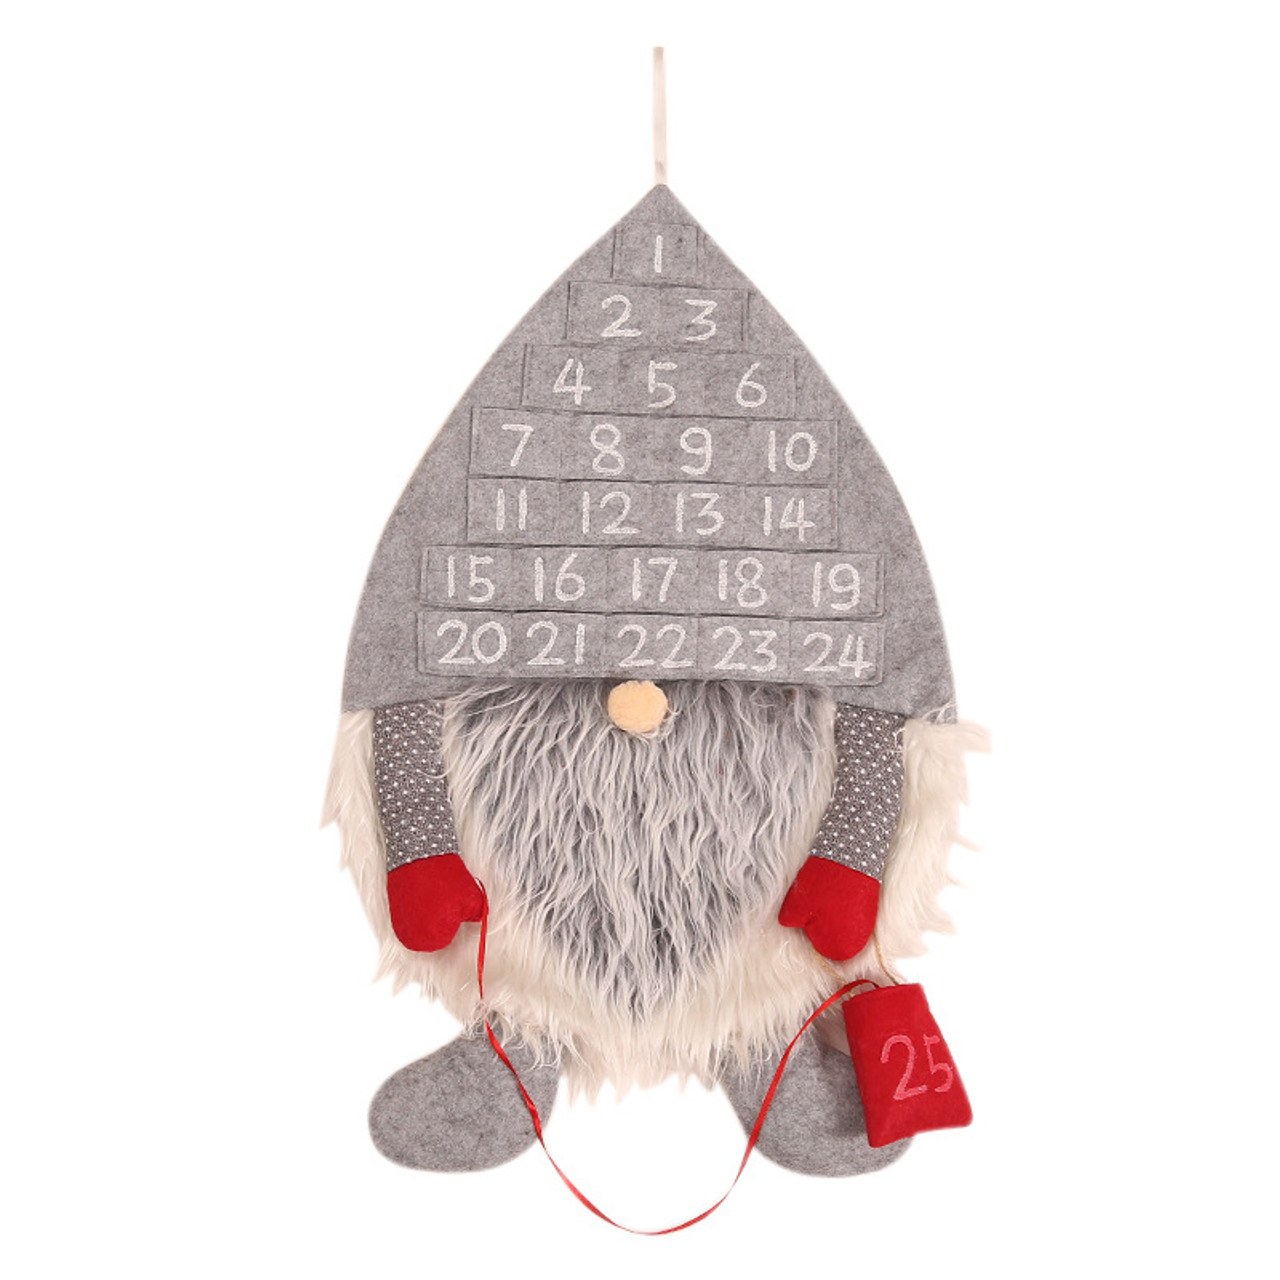 Gorgeous Elf Christmas Advent Calendar - Wall hanging. Material 55cm